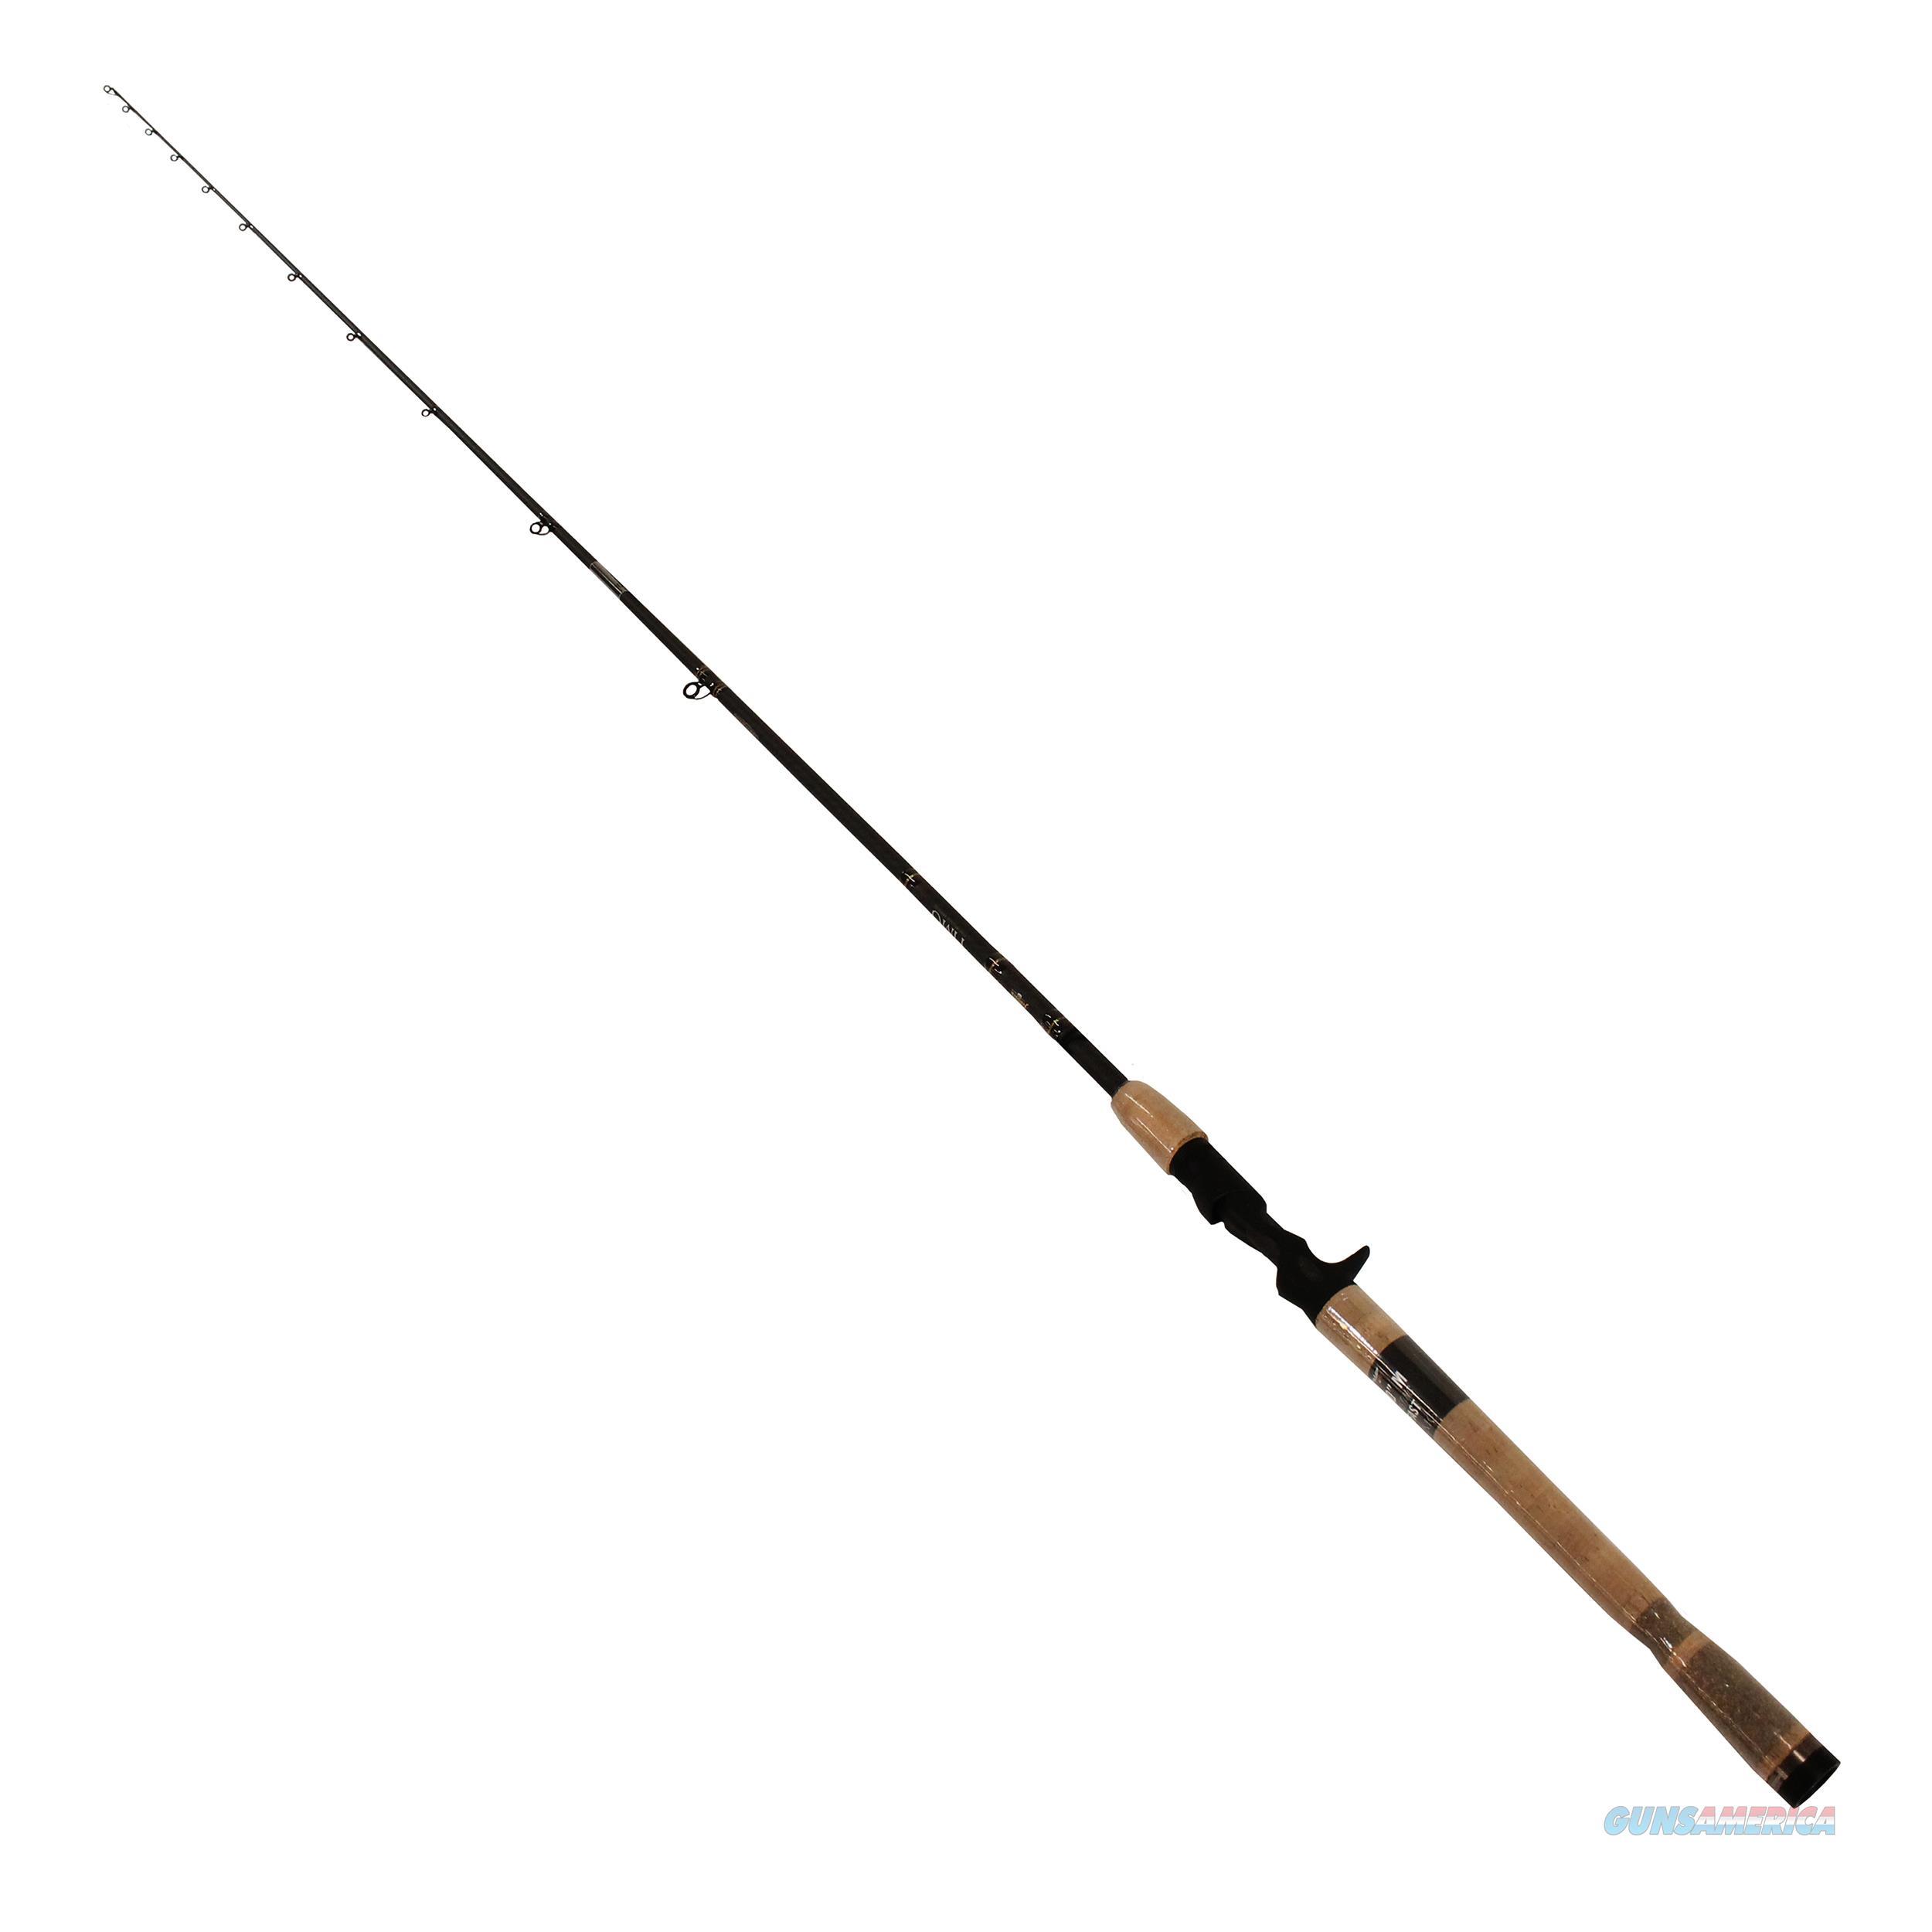 Fenwick Hmg Casting Rod HMG70M-FC  Non-Guns > Fishing/Spearfishing